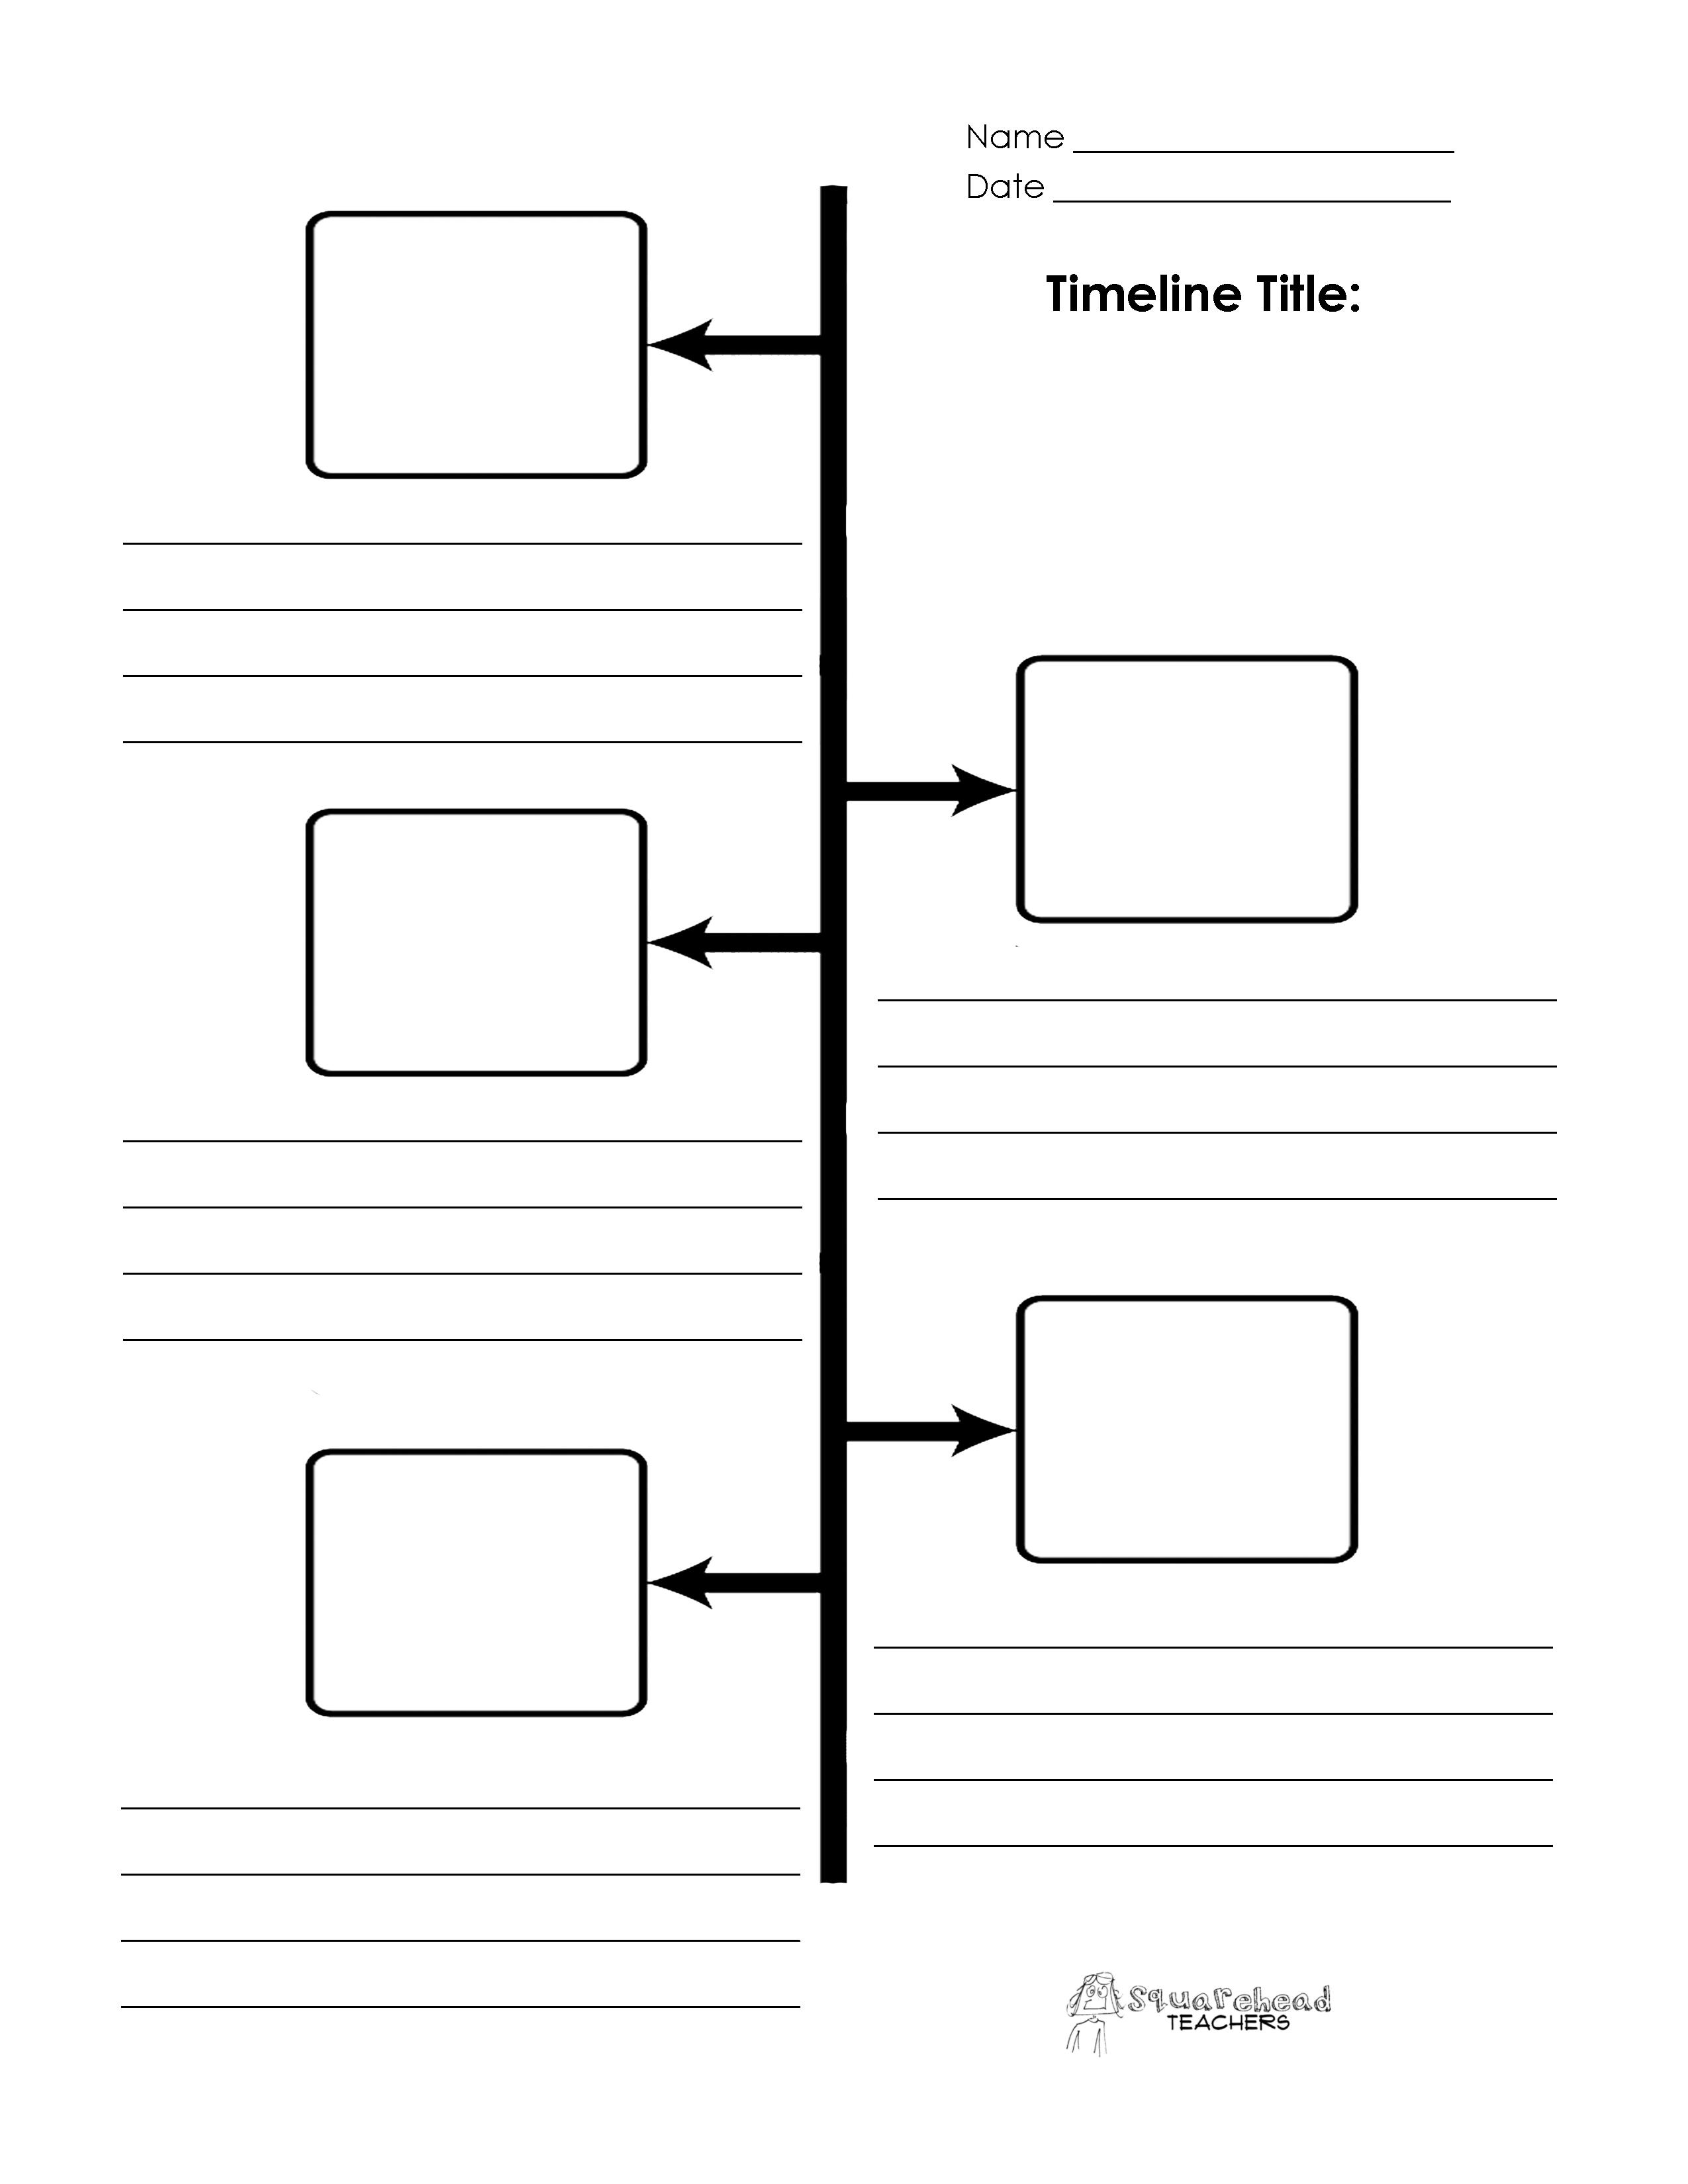 Blank Printable Timeline | Online Calendar Templates - Free Timeline Creator Printable